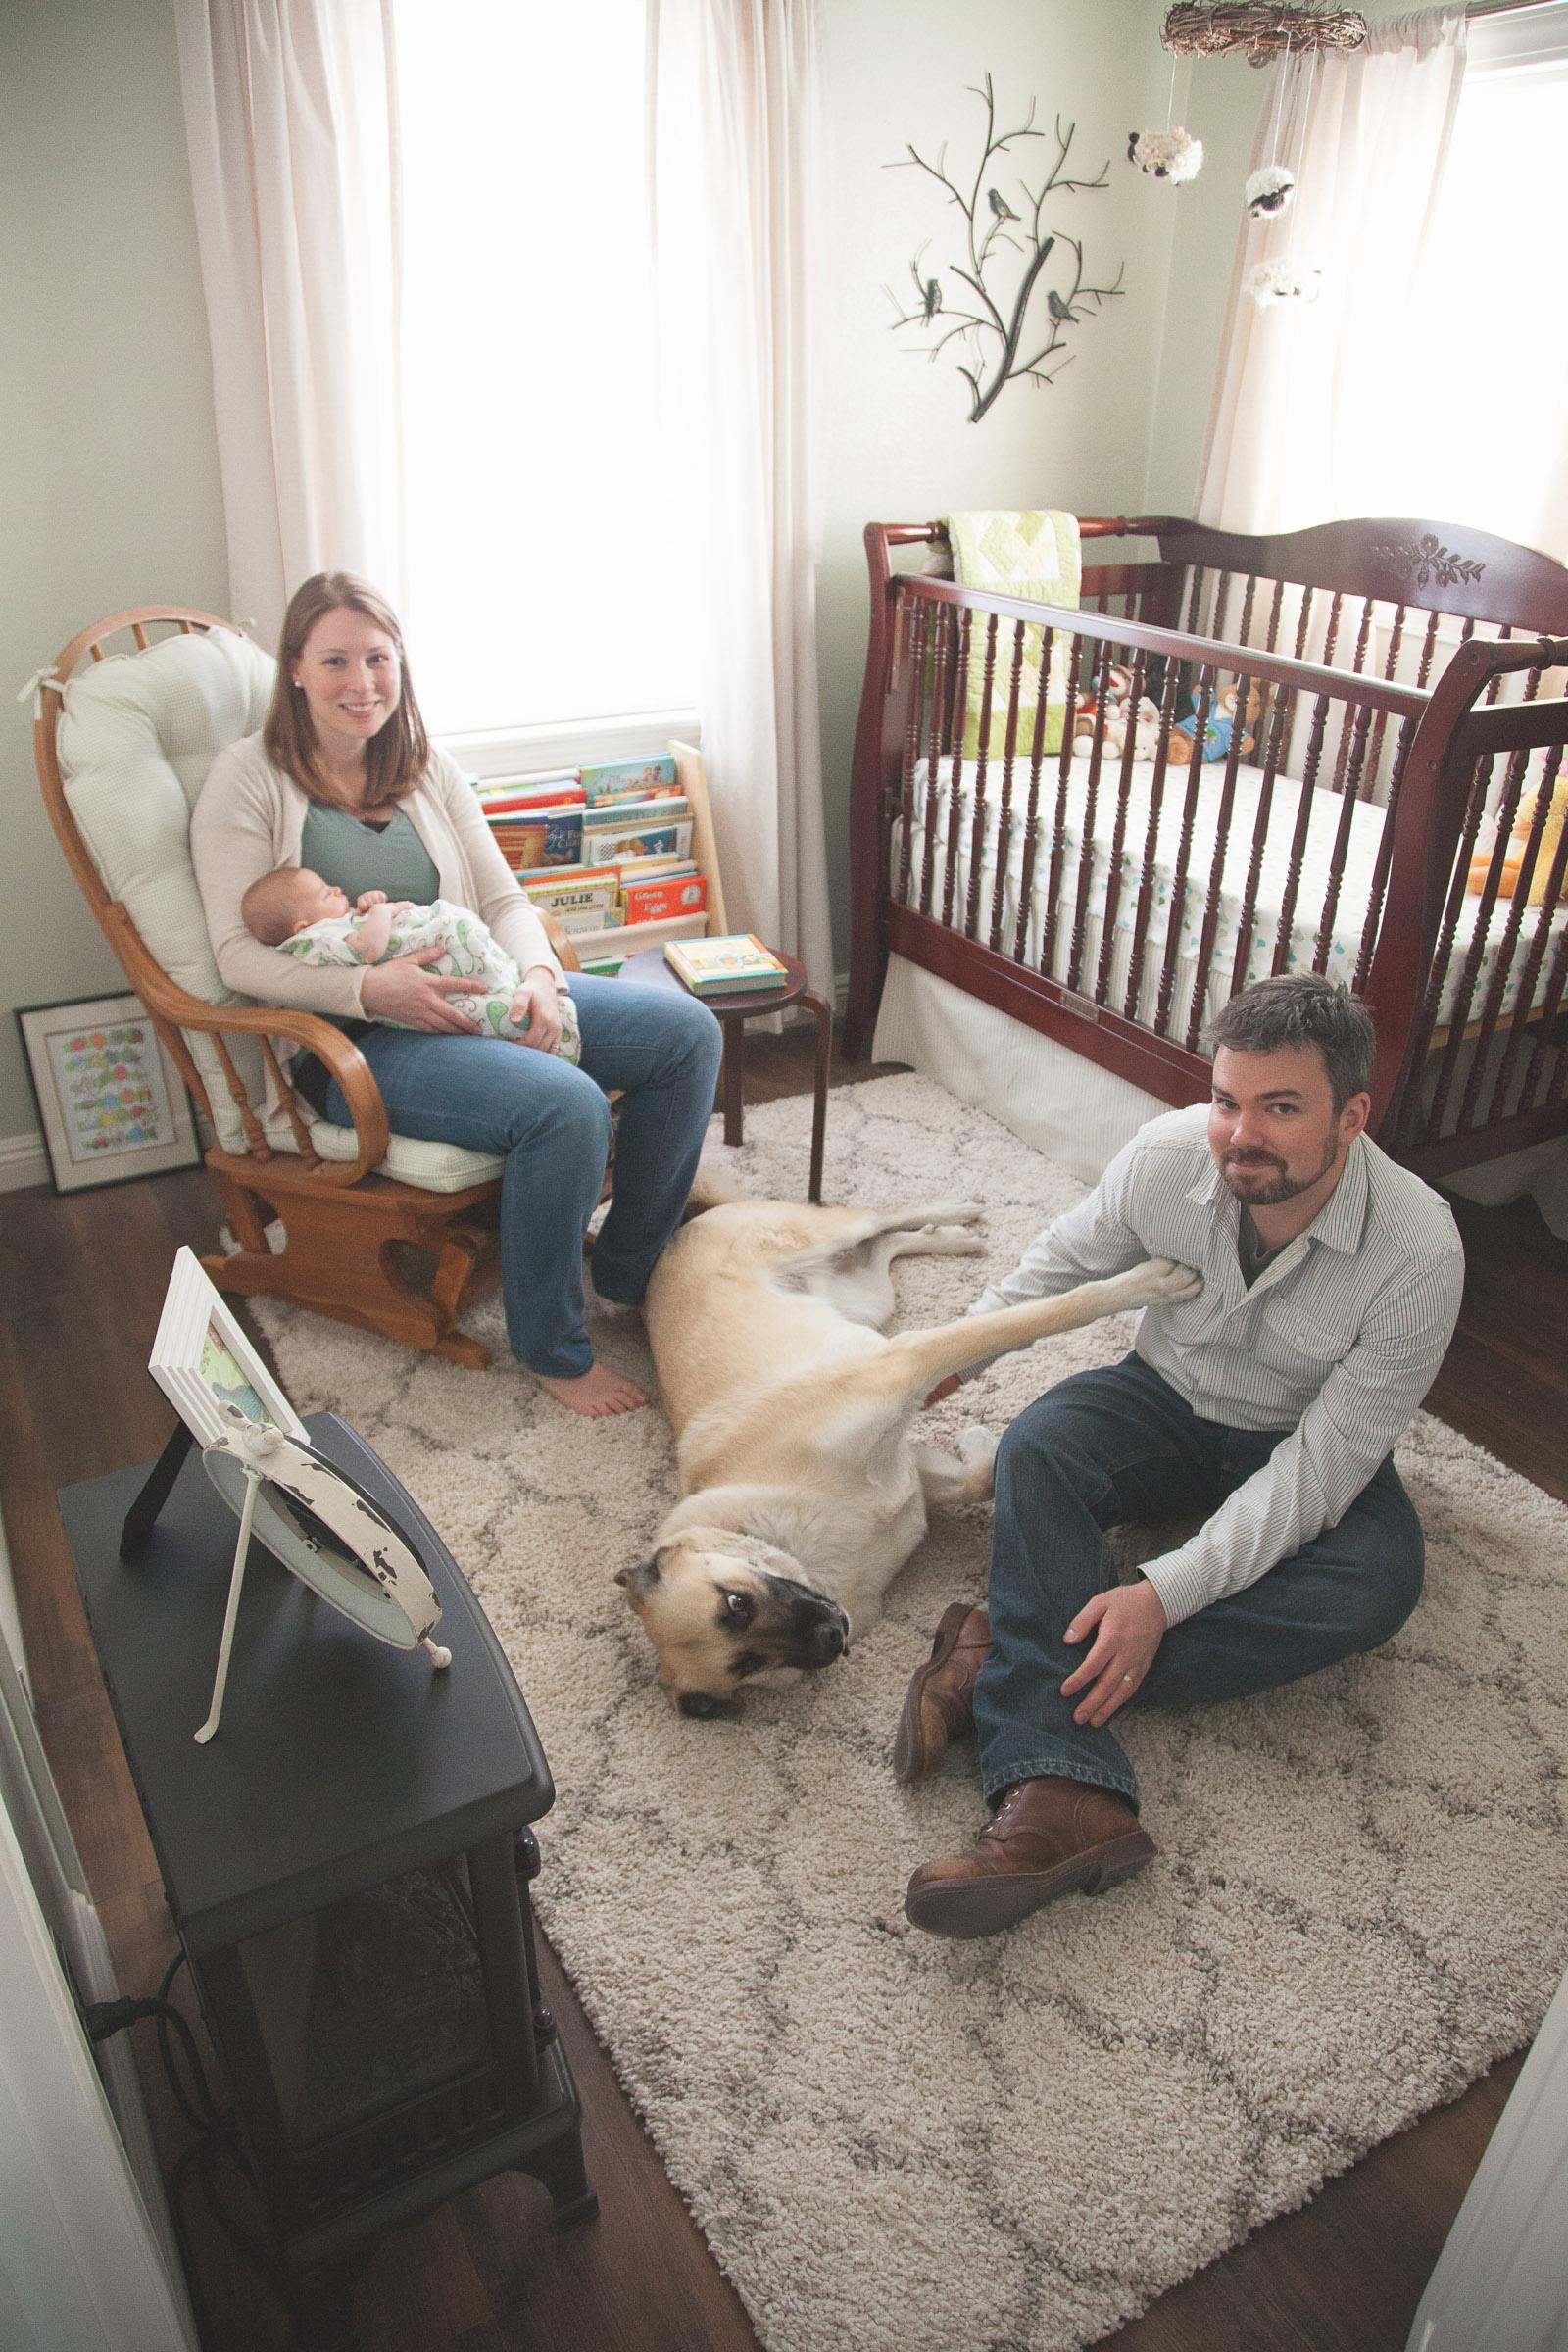 012-nursery-baby-family-birds-sleeping-woodland-new-mexico-farmington